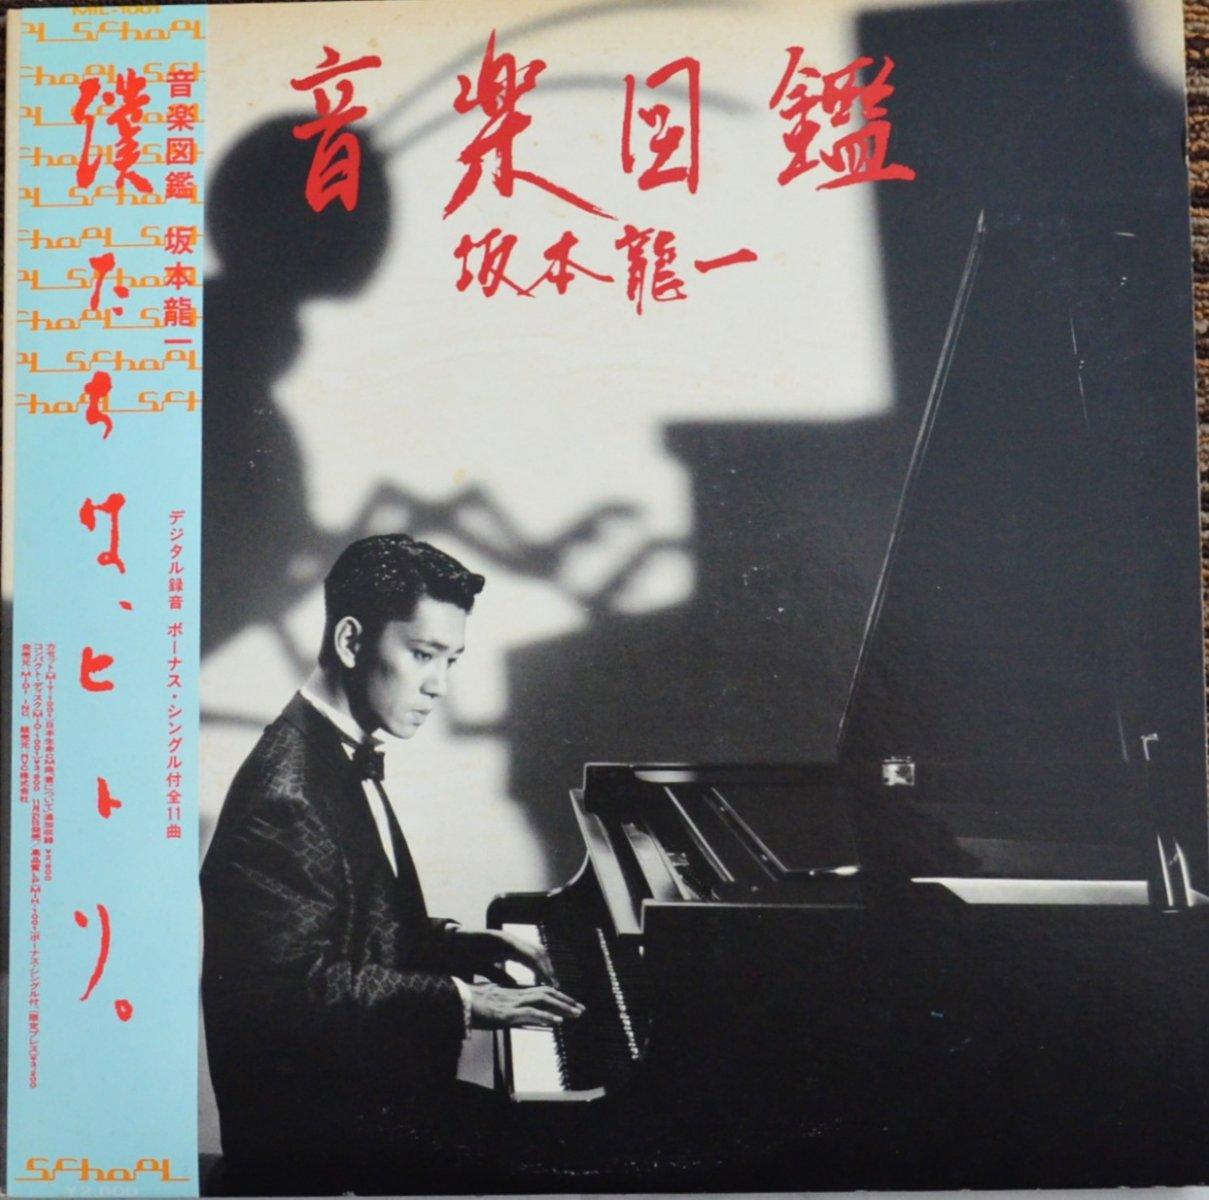 坂本龍一 RYUICHI SAKAMOTO / 音楽図鑑 (7